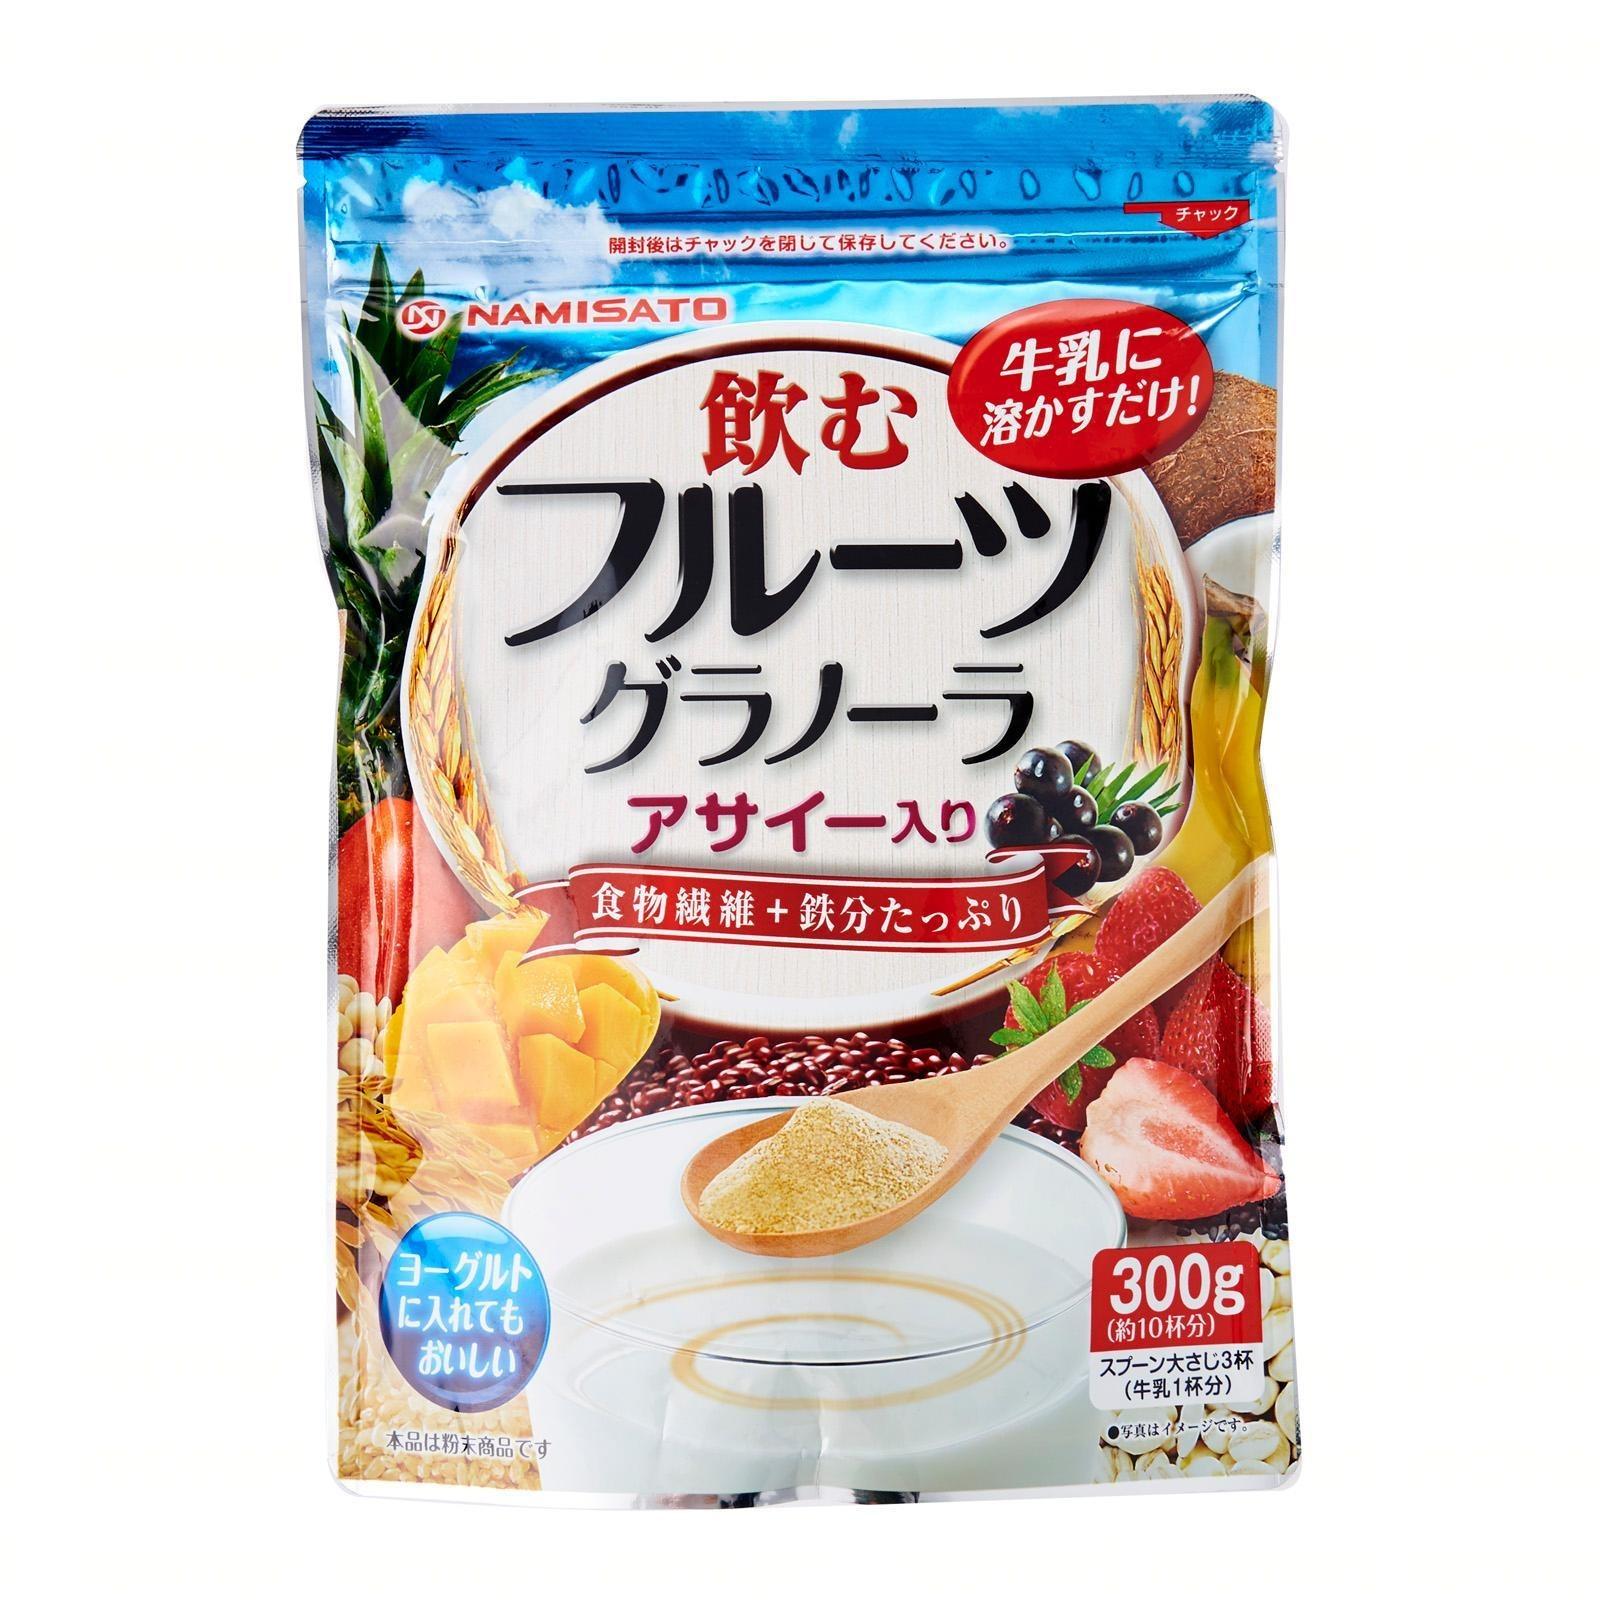 Namisato Acai Fruit Granola Beverage Powder - Kirei